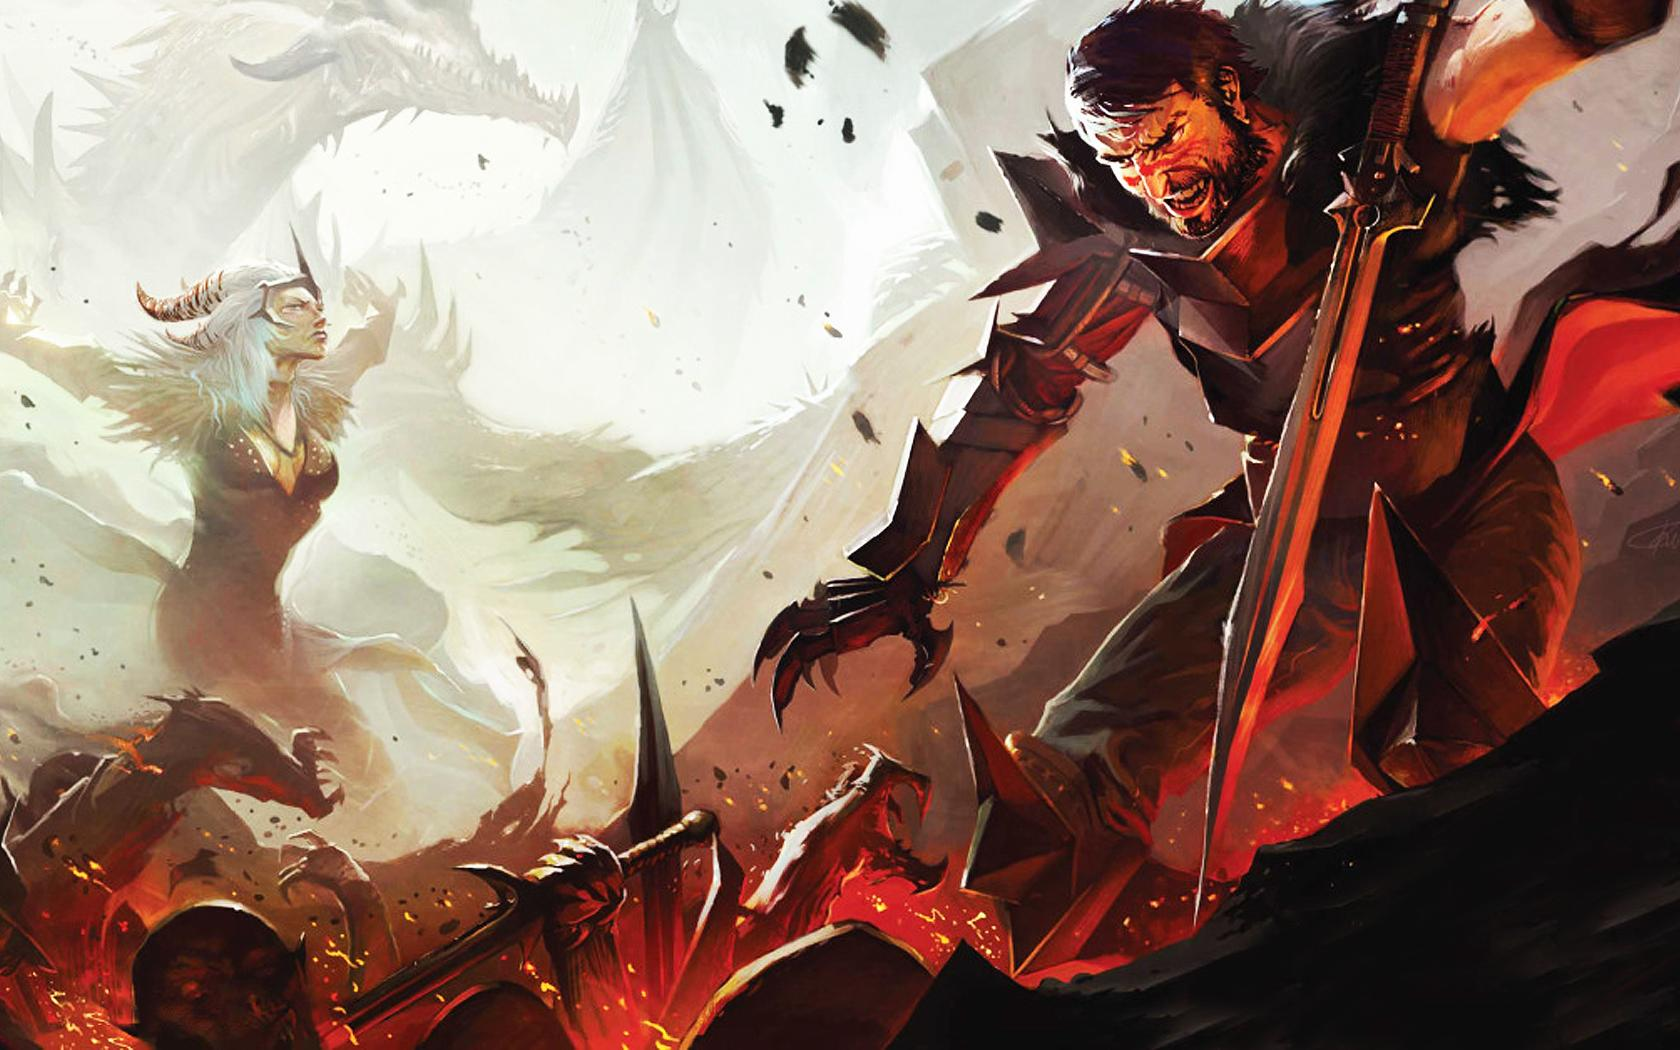 Арт к игре Dragon Age 2